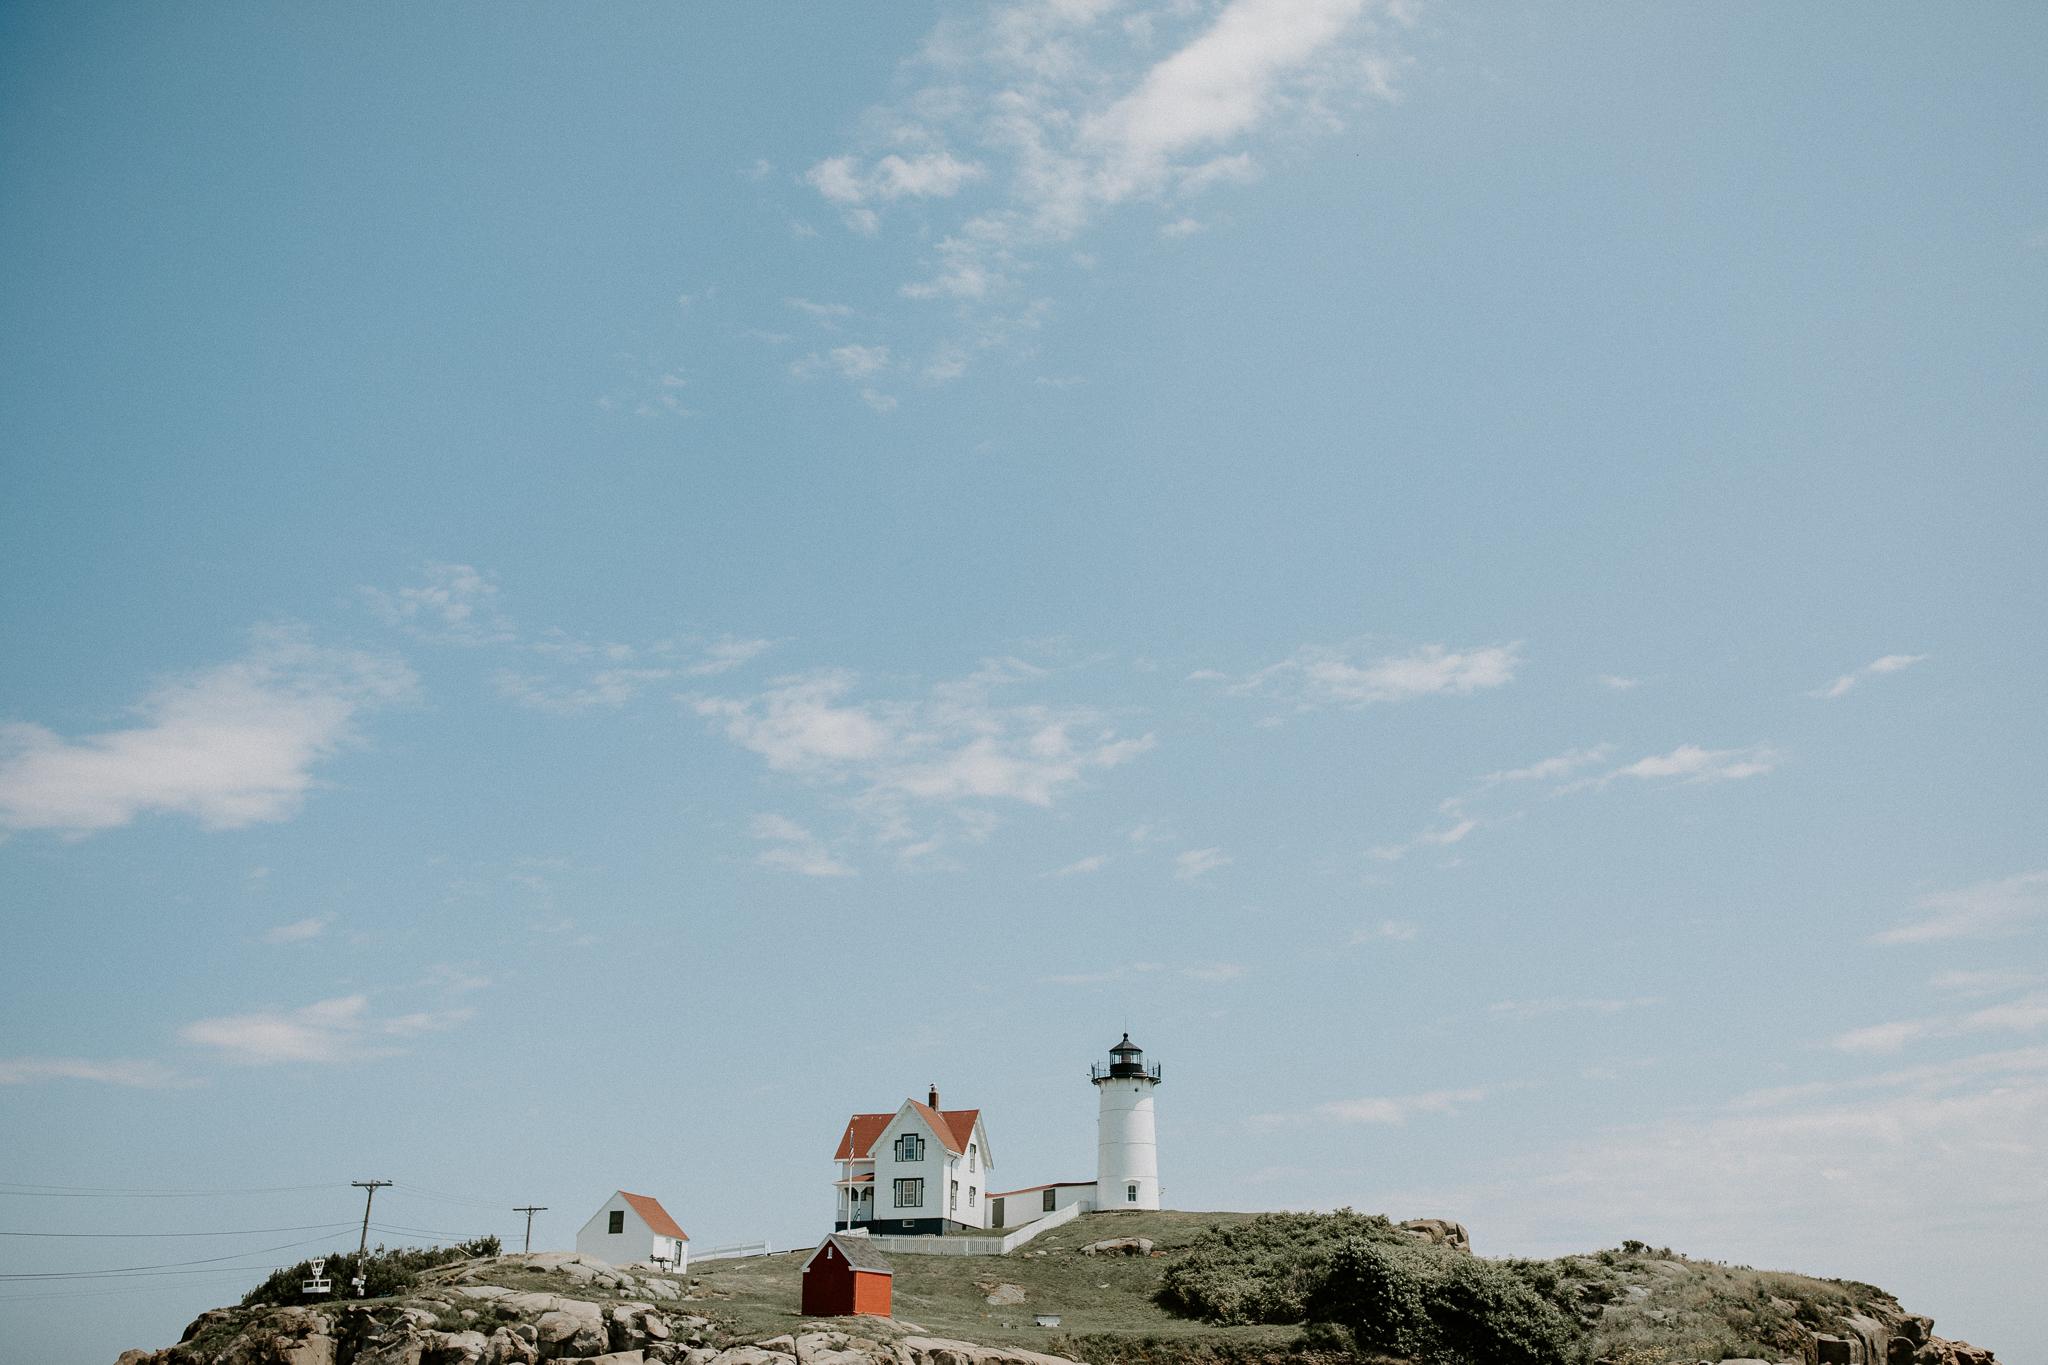 York, Maine Lighthouse by photographer, Allie Chambers